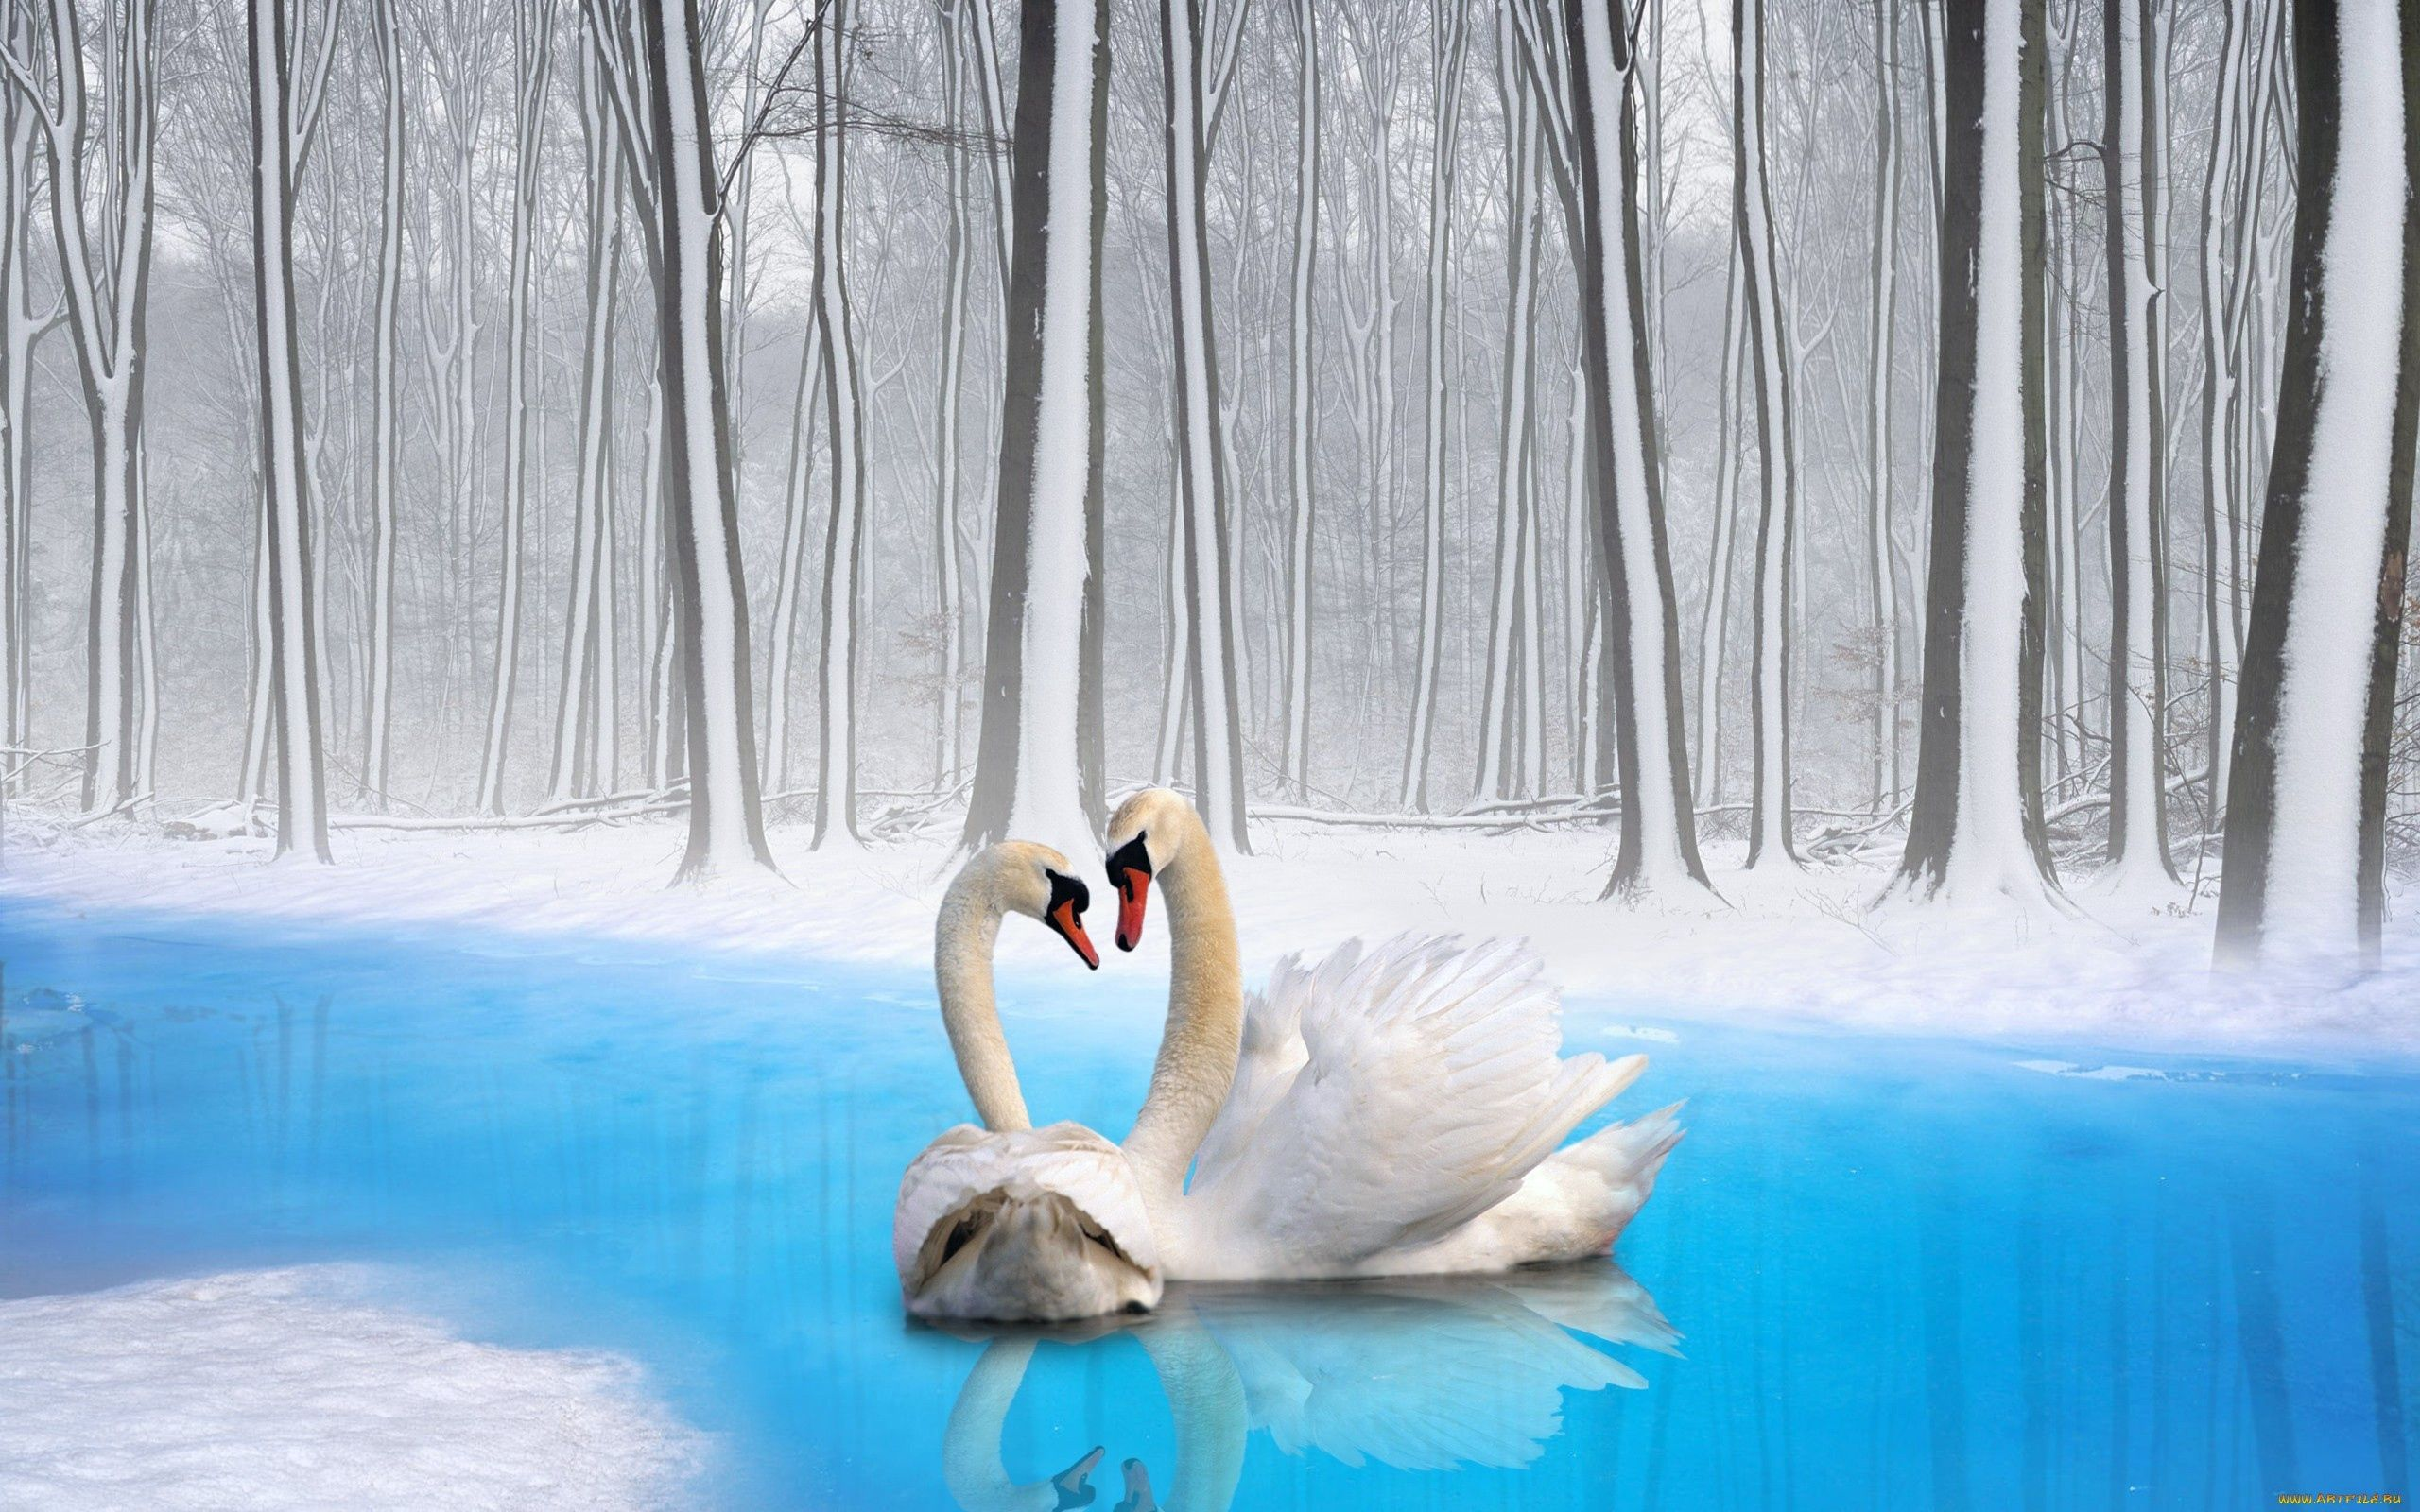 130245 Hintergrundbild herunterladen Tiere, Vögel, Swans, Paar, Treue - Bildschirmschoner und Bilder kostenlos